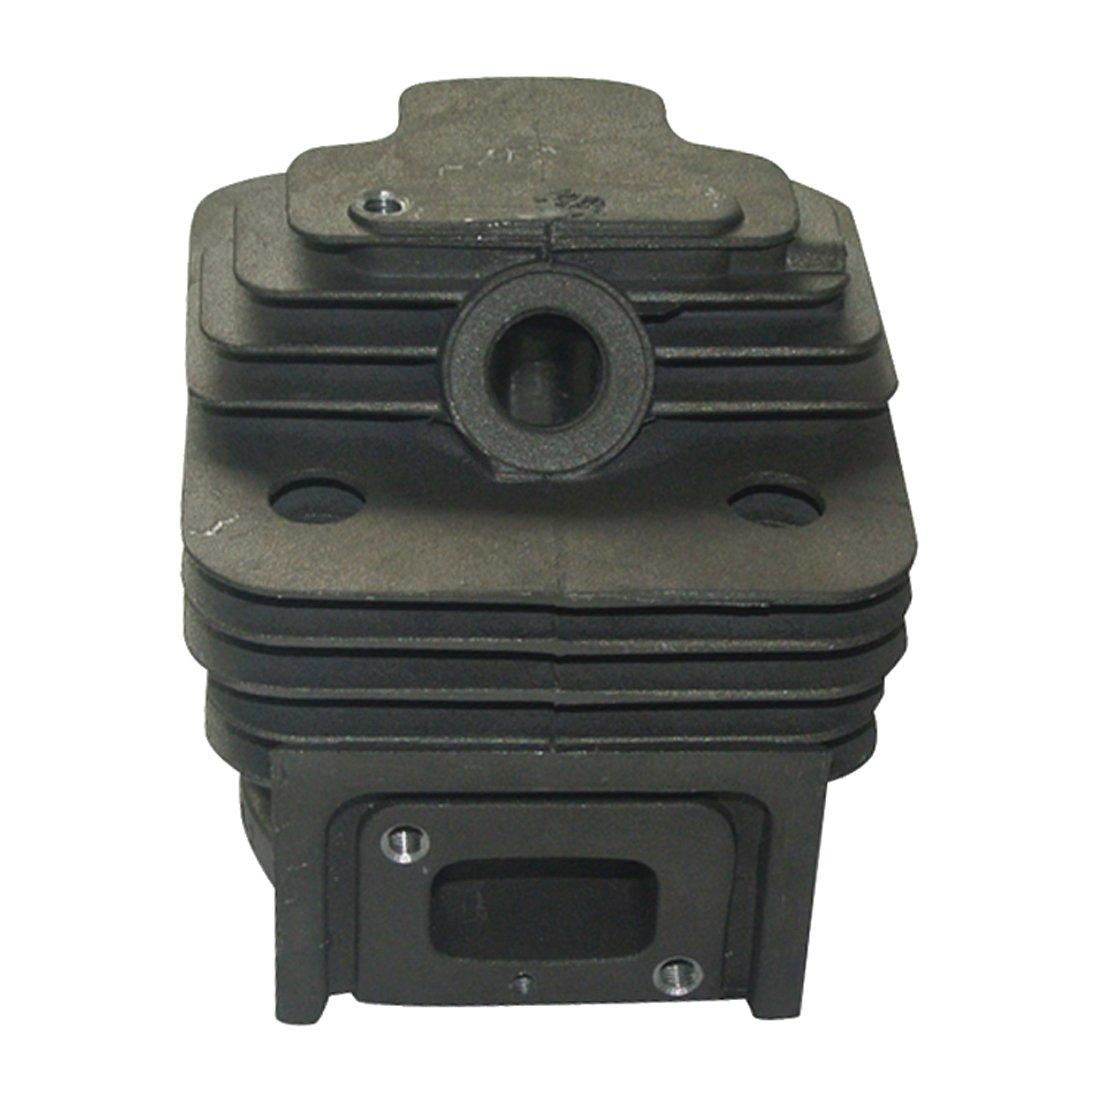 Sthus 44mm Cylinder Piston Kit For Mitsubishi TL52 Engine Motor BG520 Bushcutter by Sthus (Image #2)